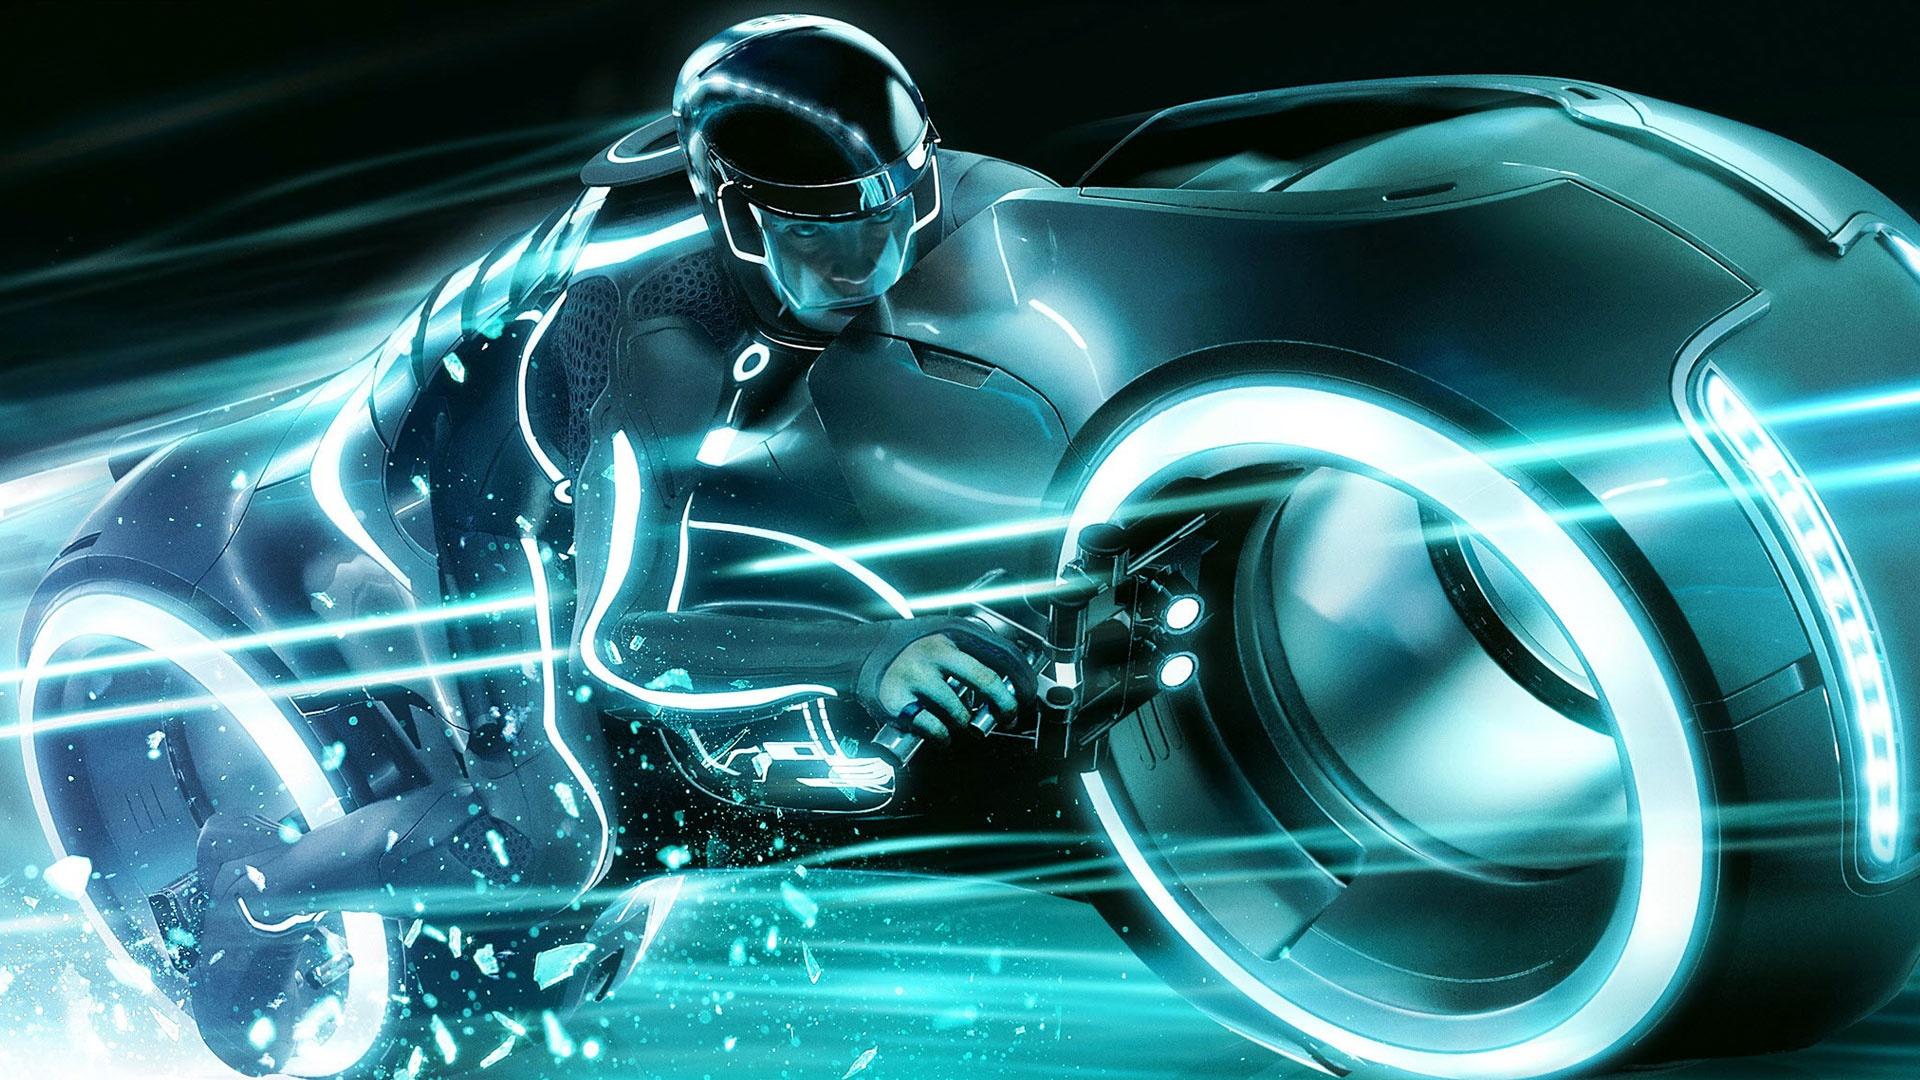 Download Free Bikes And Cars Desktop Wallpapers Screen Savers